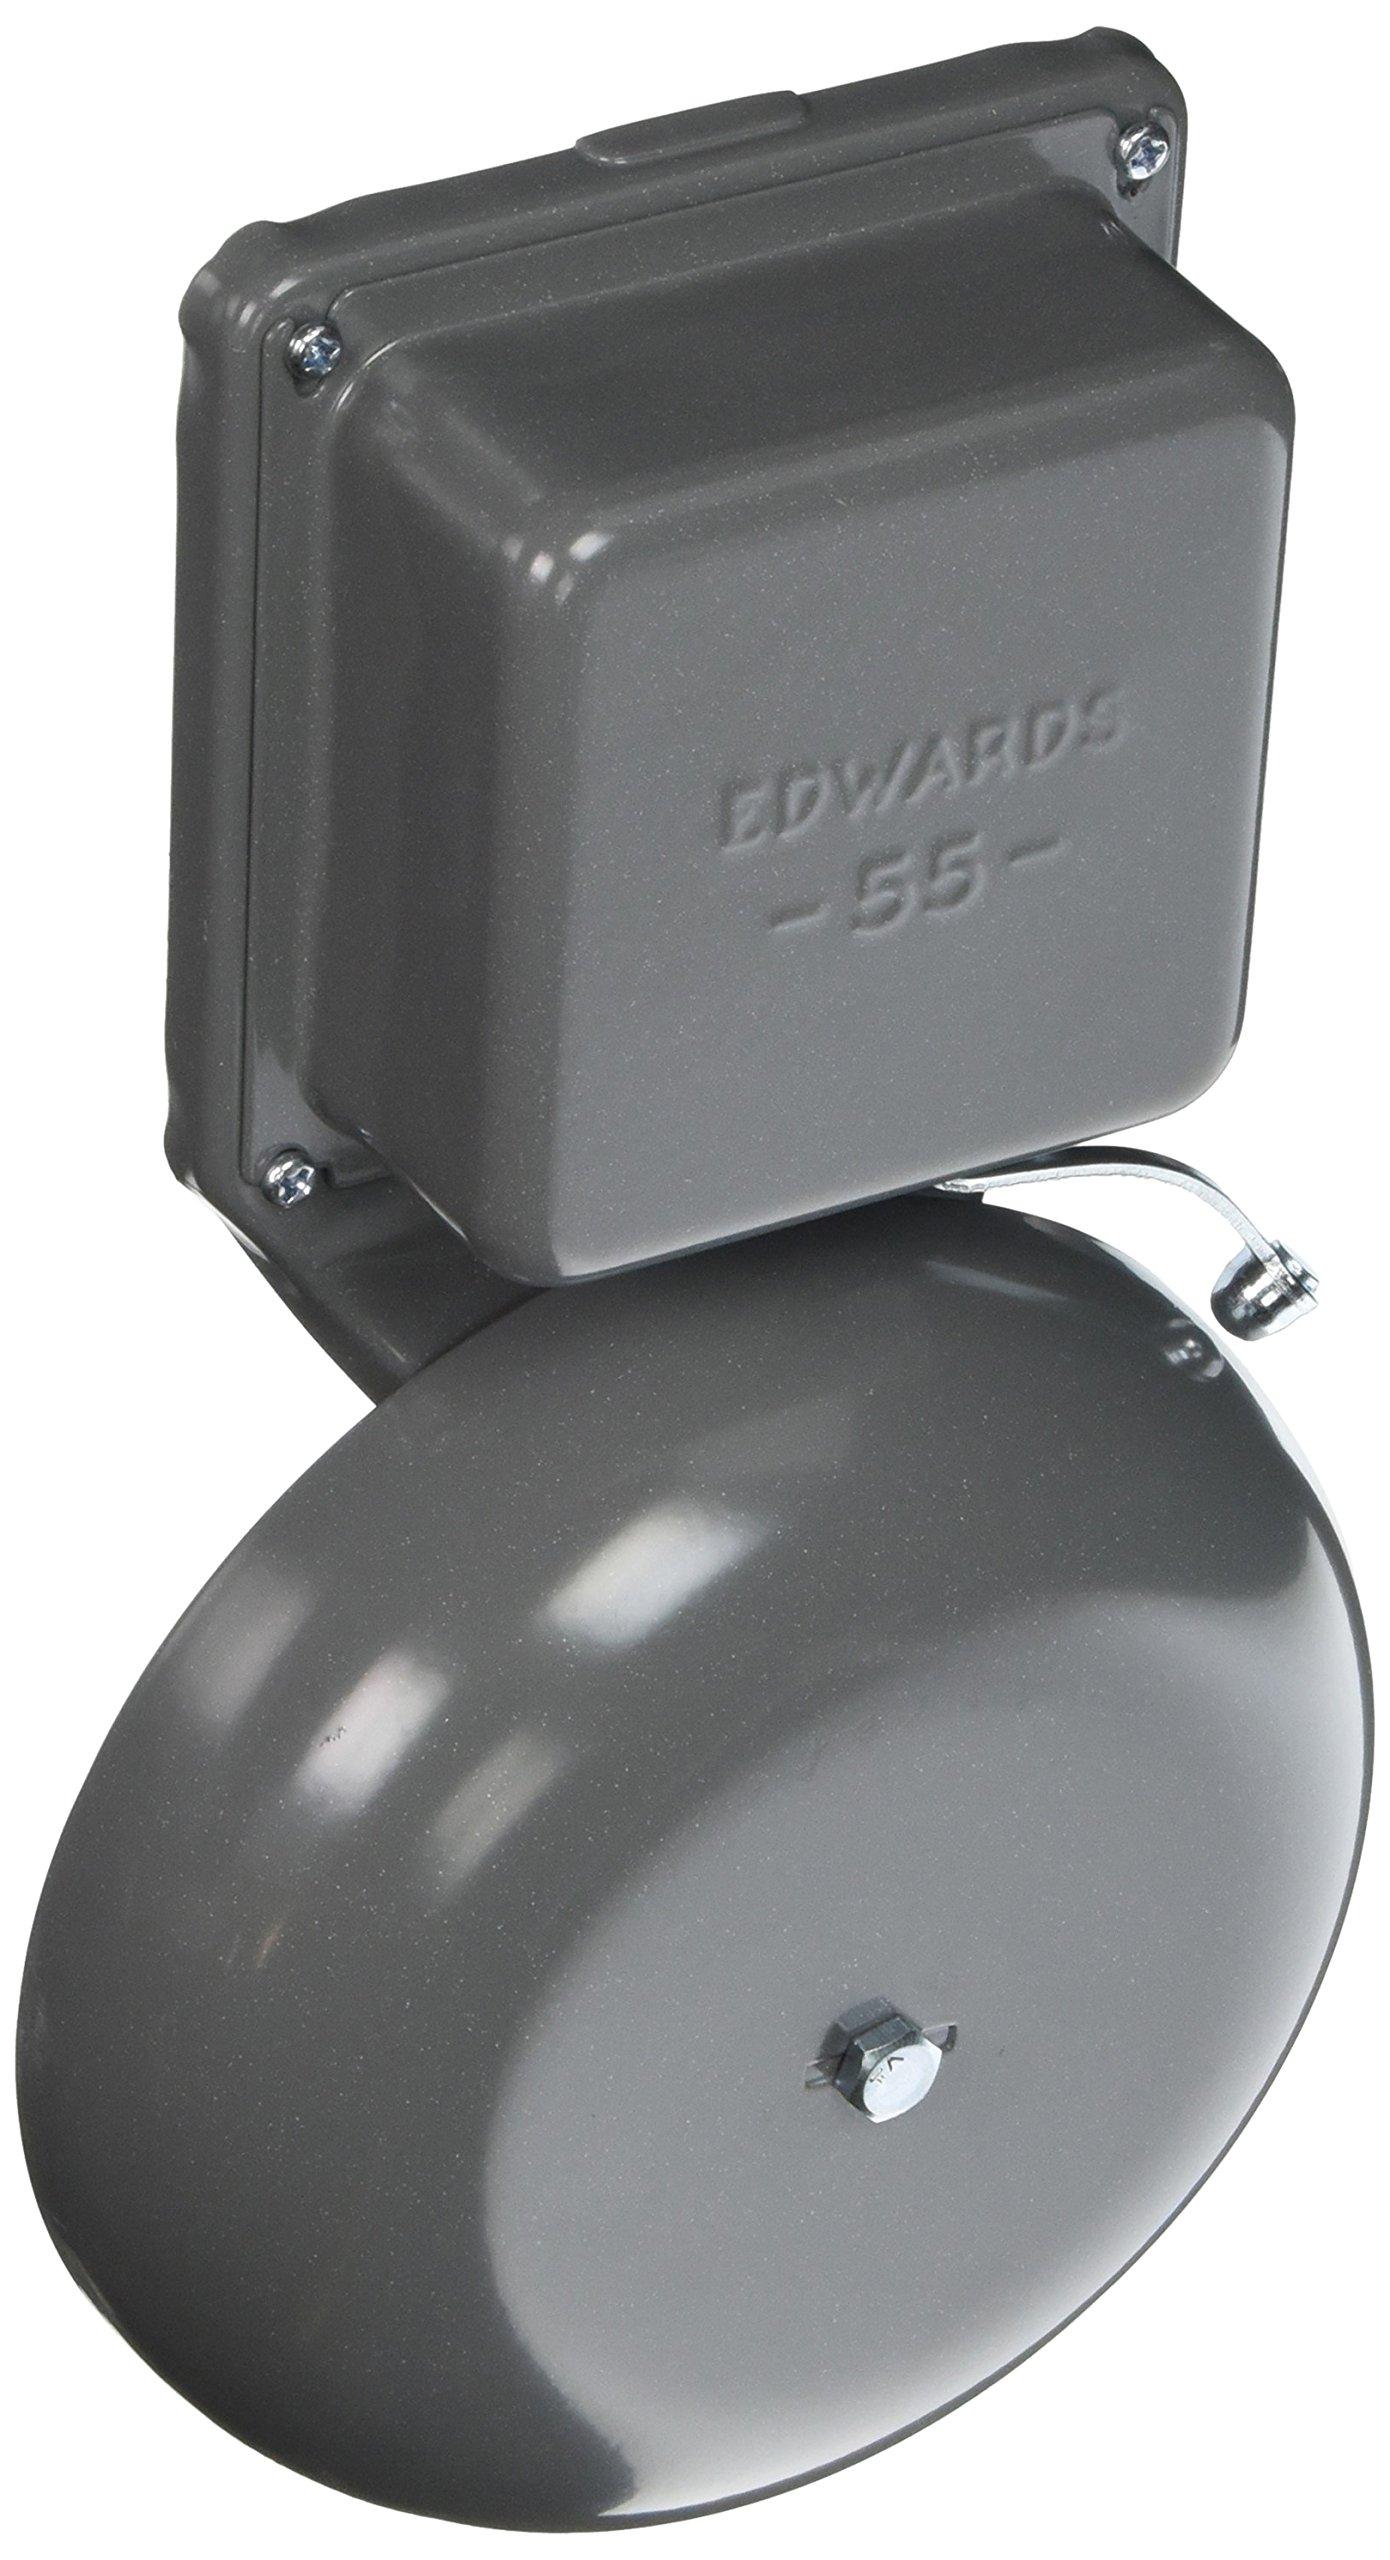 Edwards Signaling 55-6G5 Bell 6'' 24V60HZ by Edwards-Signaling (Image #1)